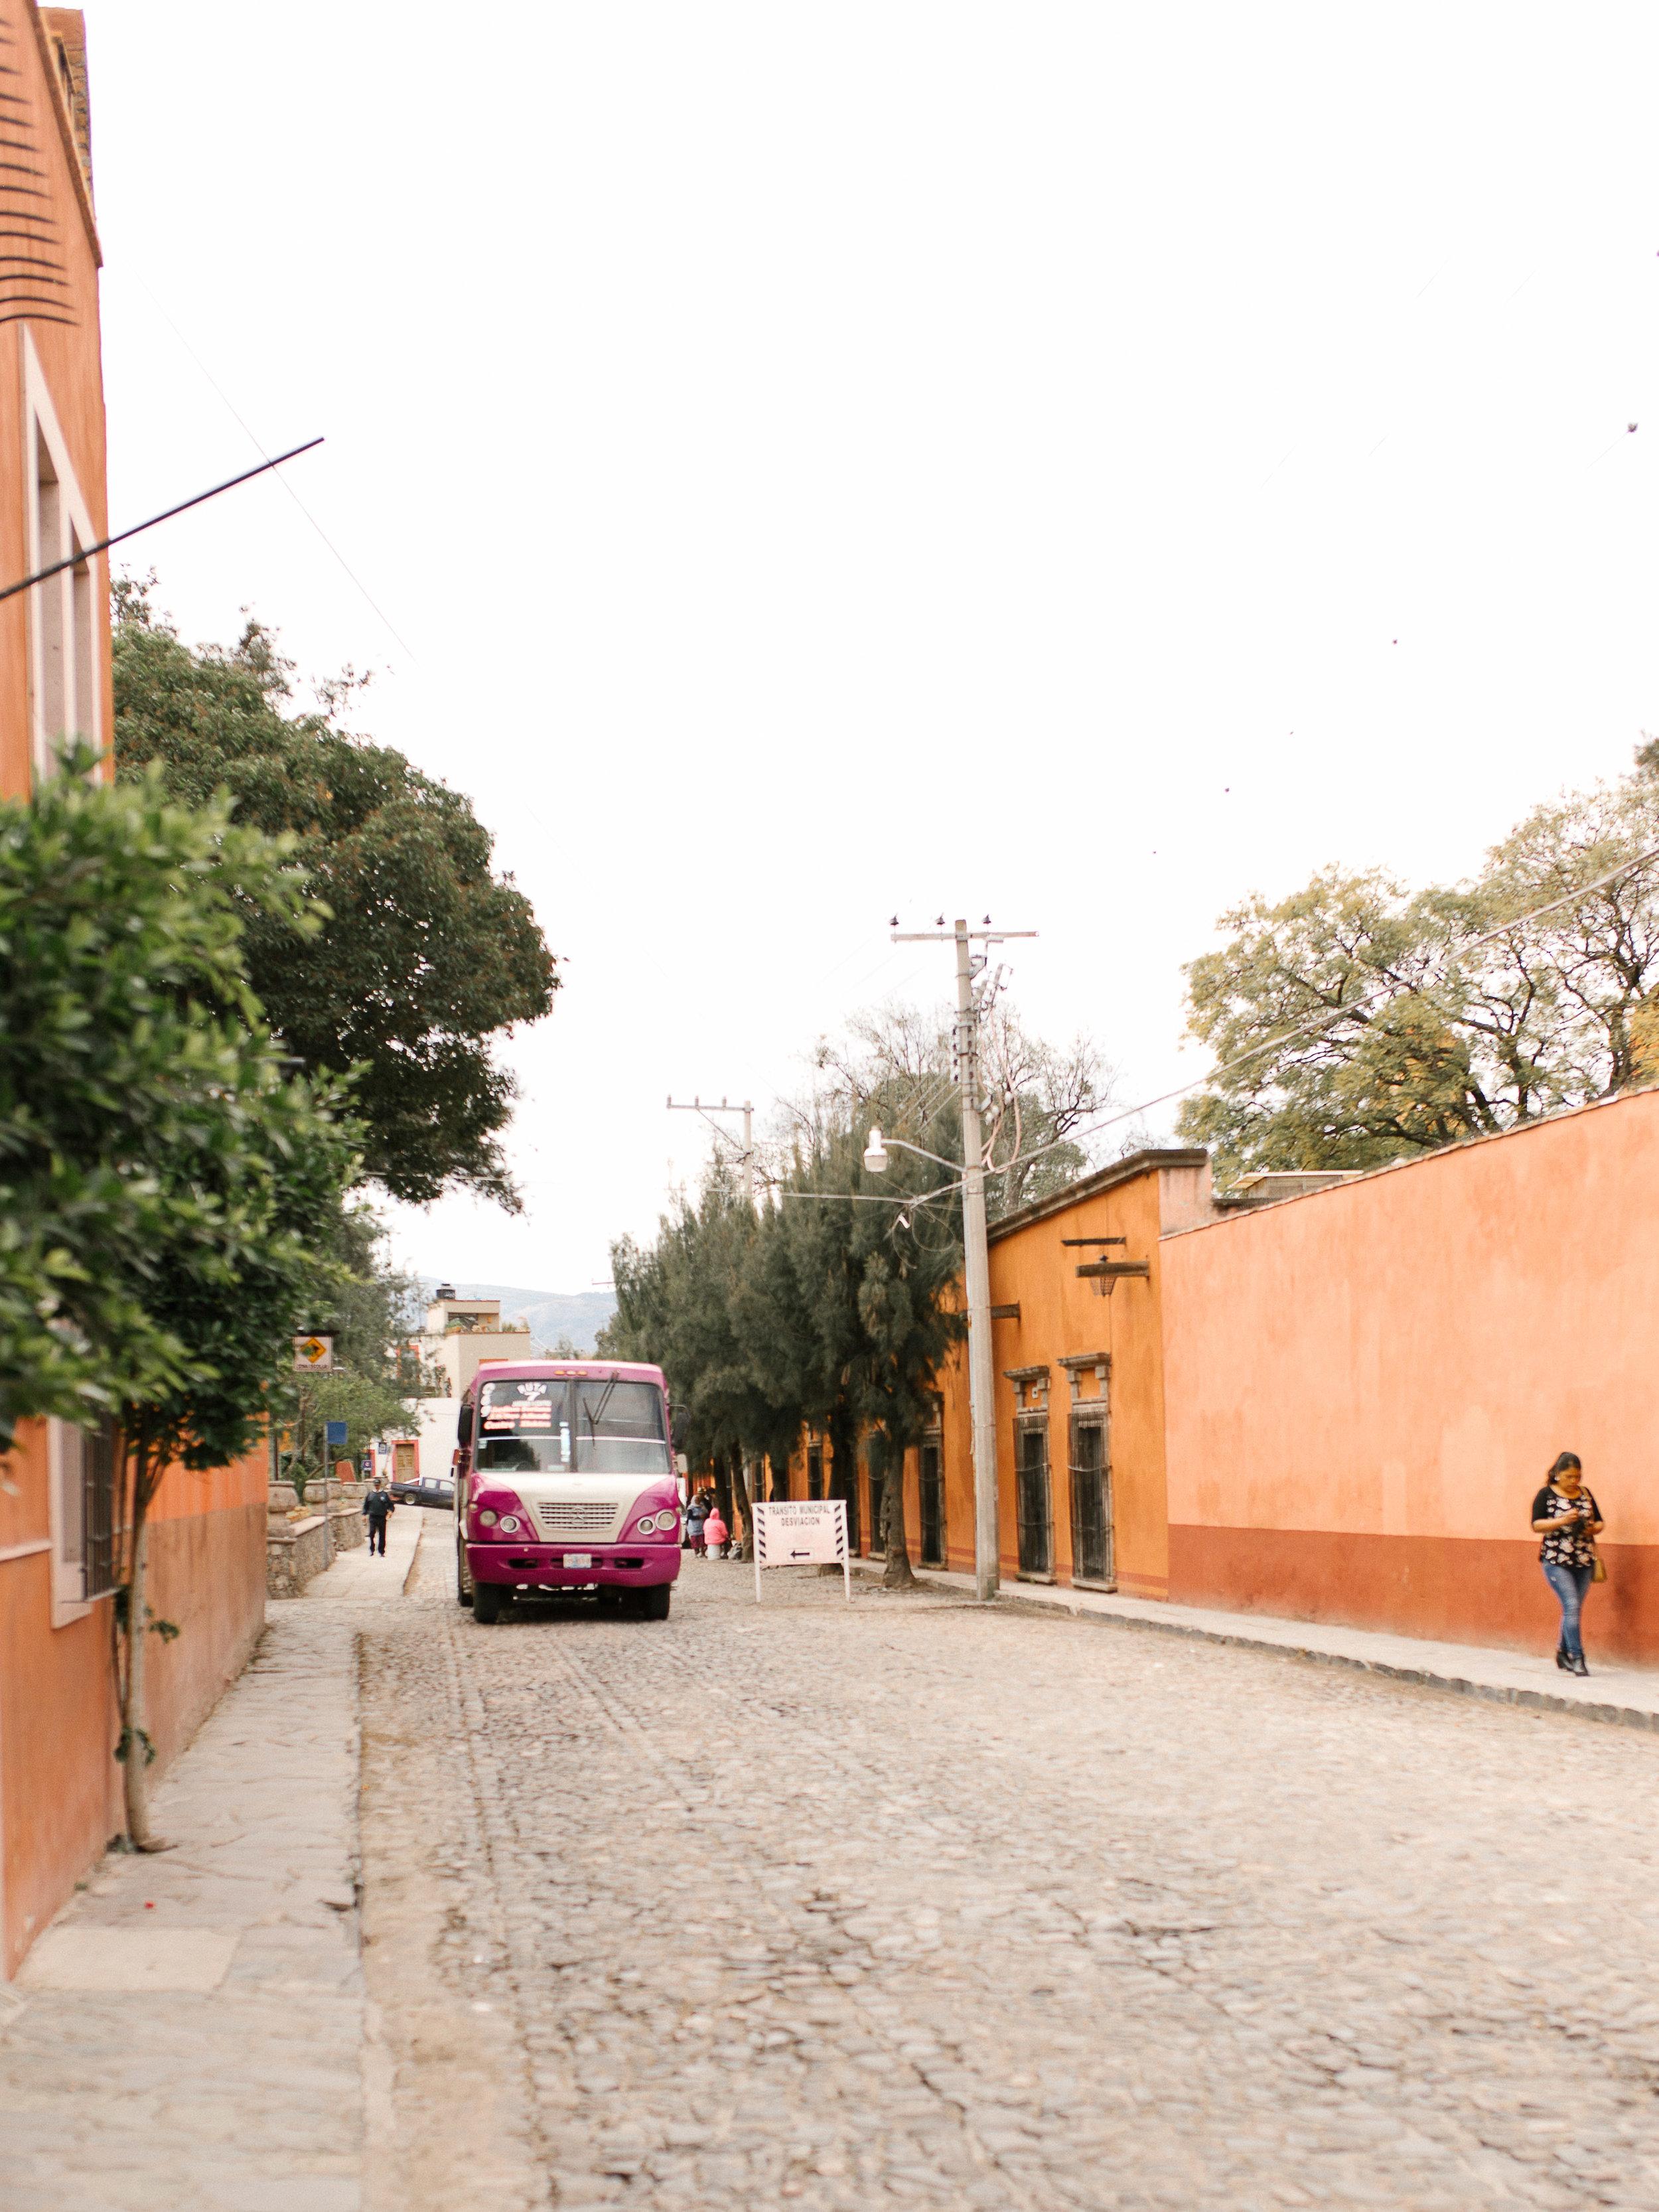 Travel Photos Chelsea Macor Photography San Miguel de Allende Mexico Seattle Photographer-2.jpg